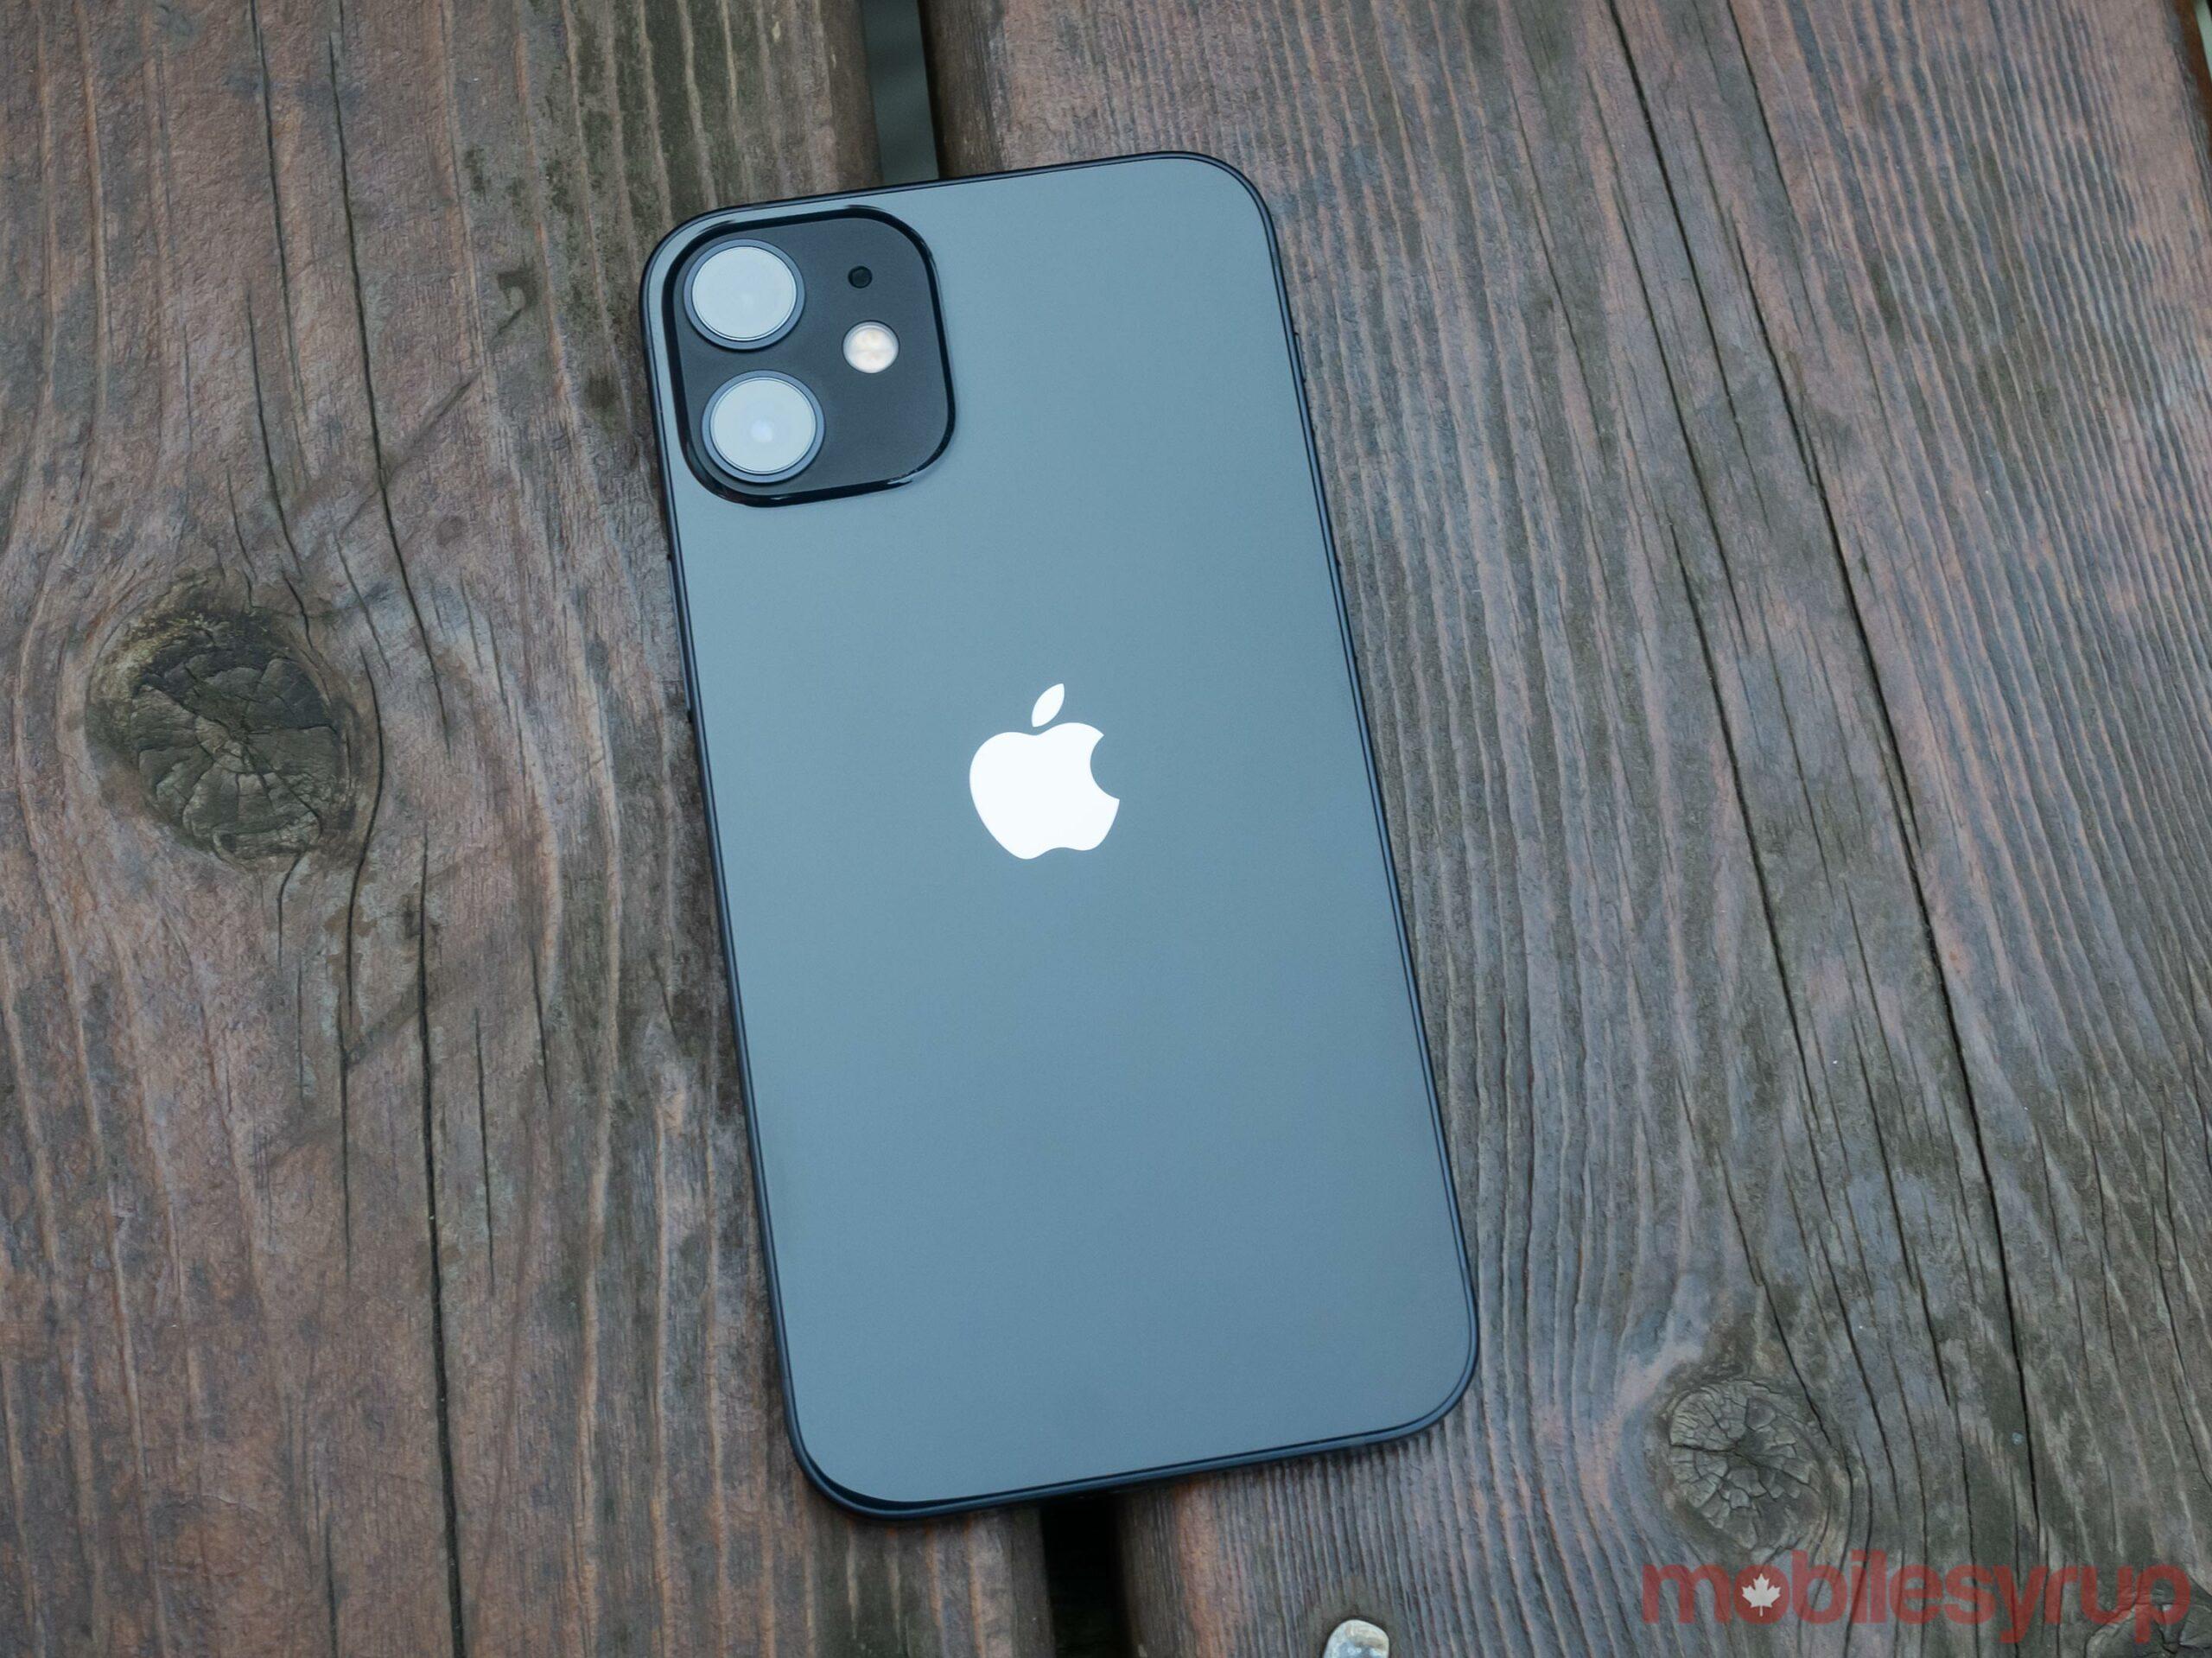 Back of the Black iPhone 12 mini